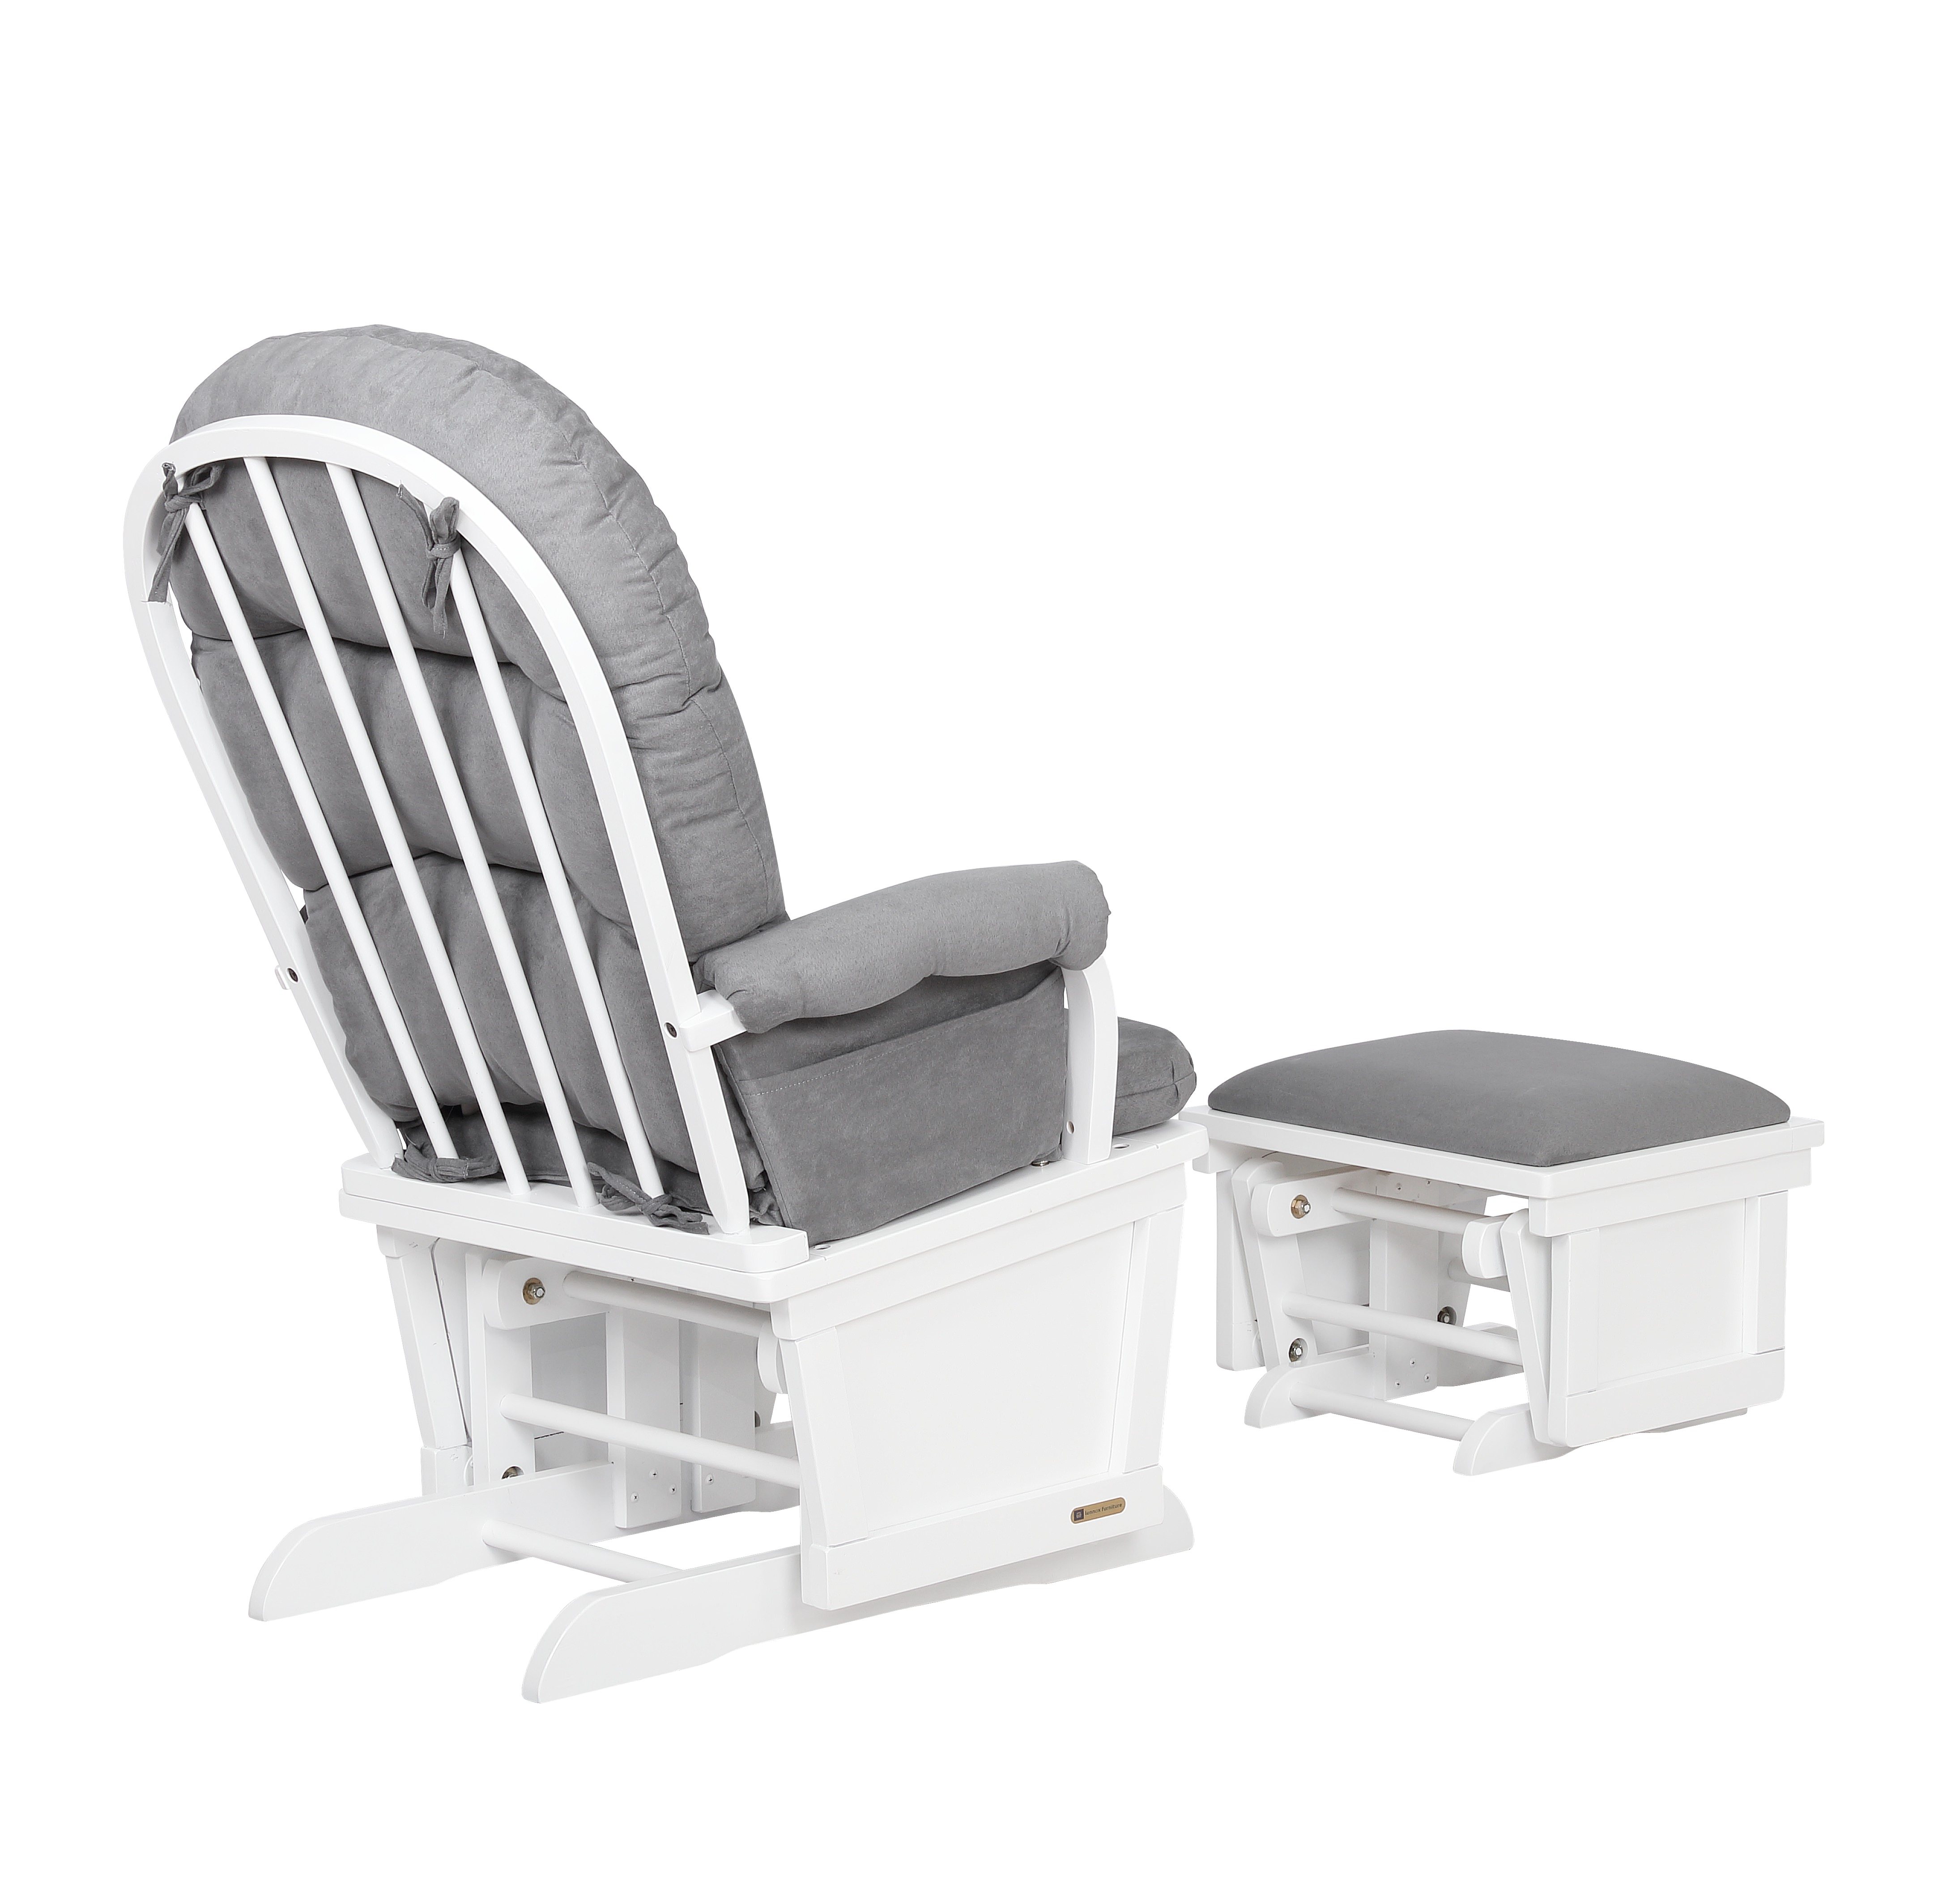 Glider Chair And Ottoman Set White Grey 7580cb 15 1139